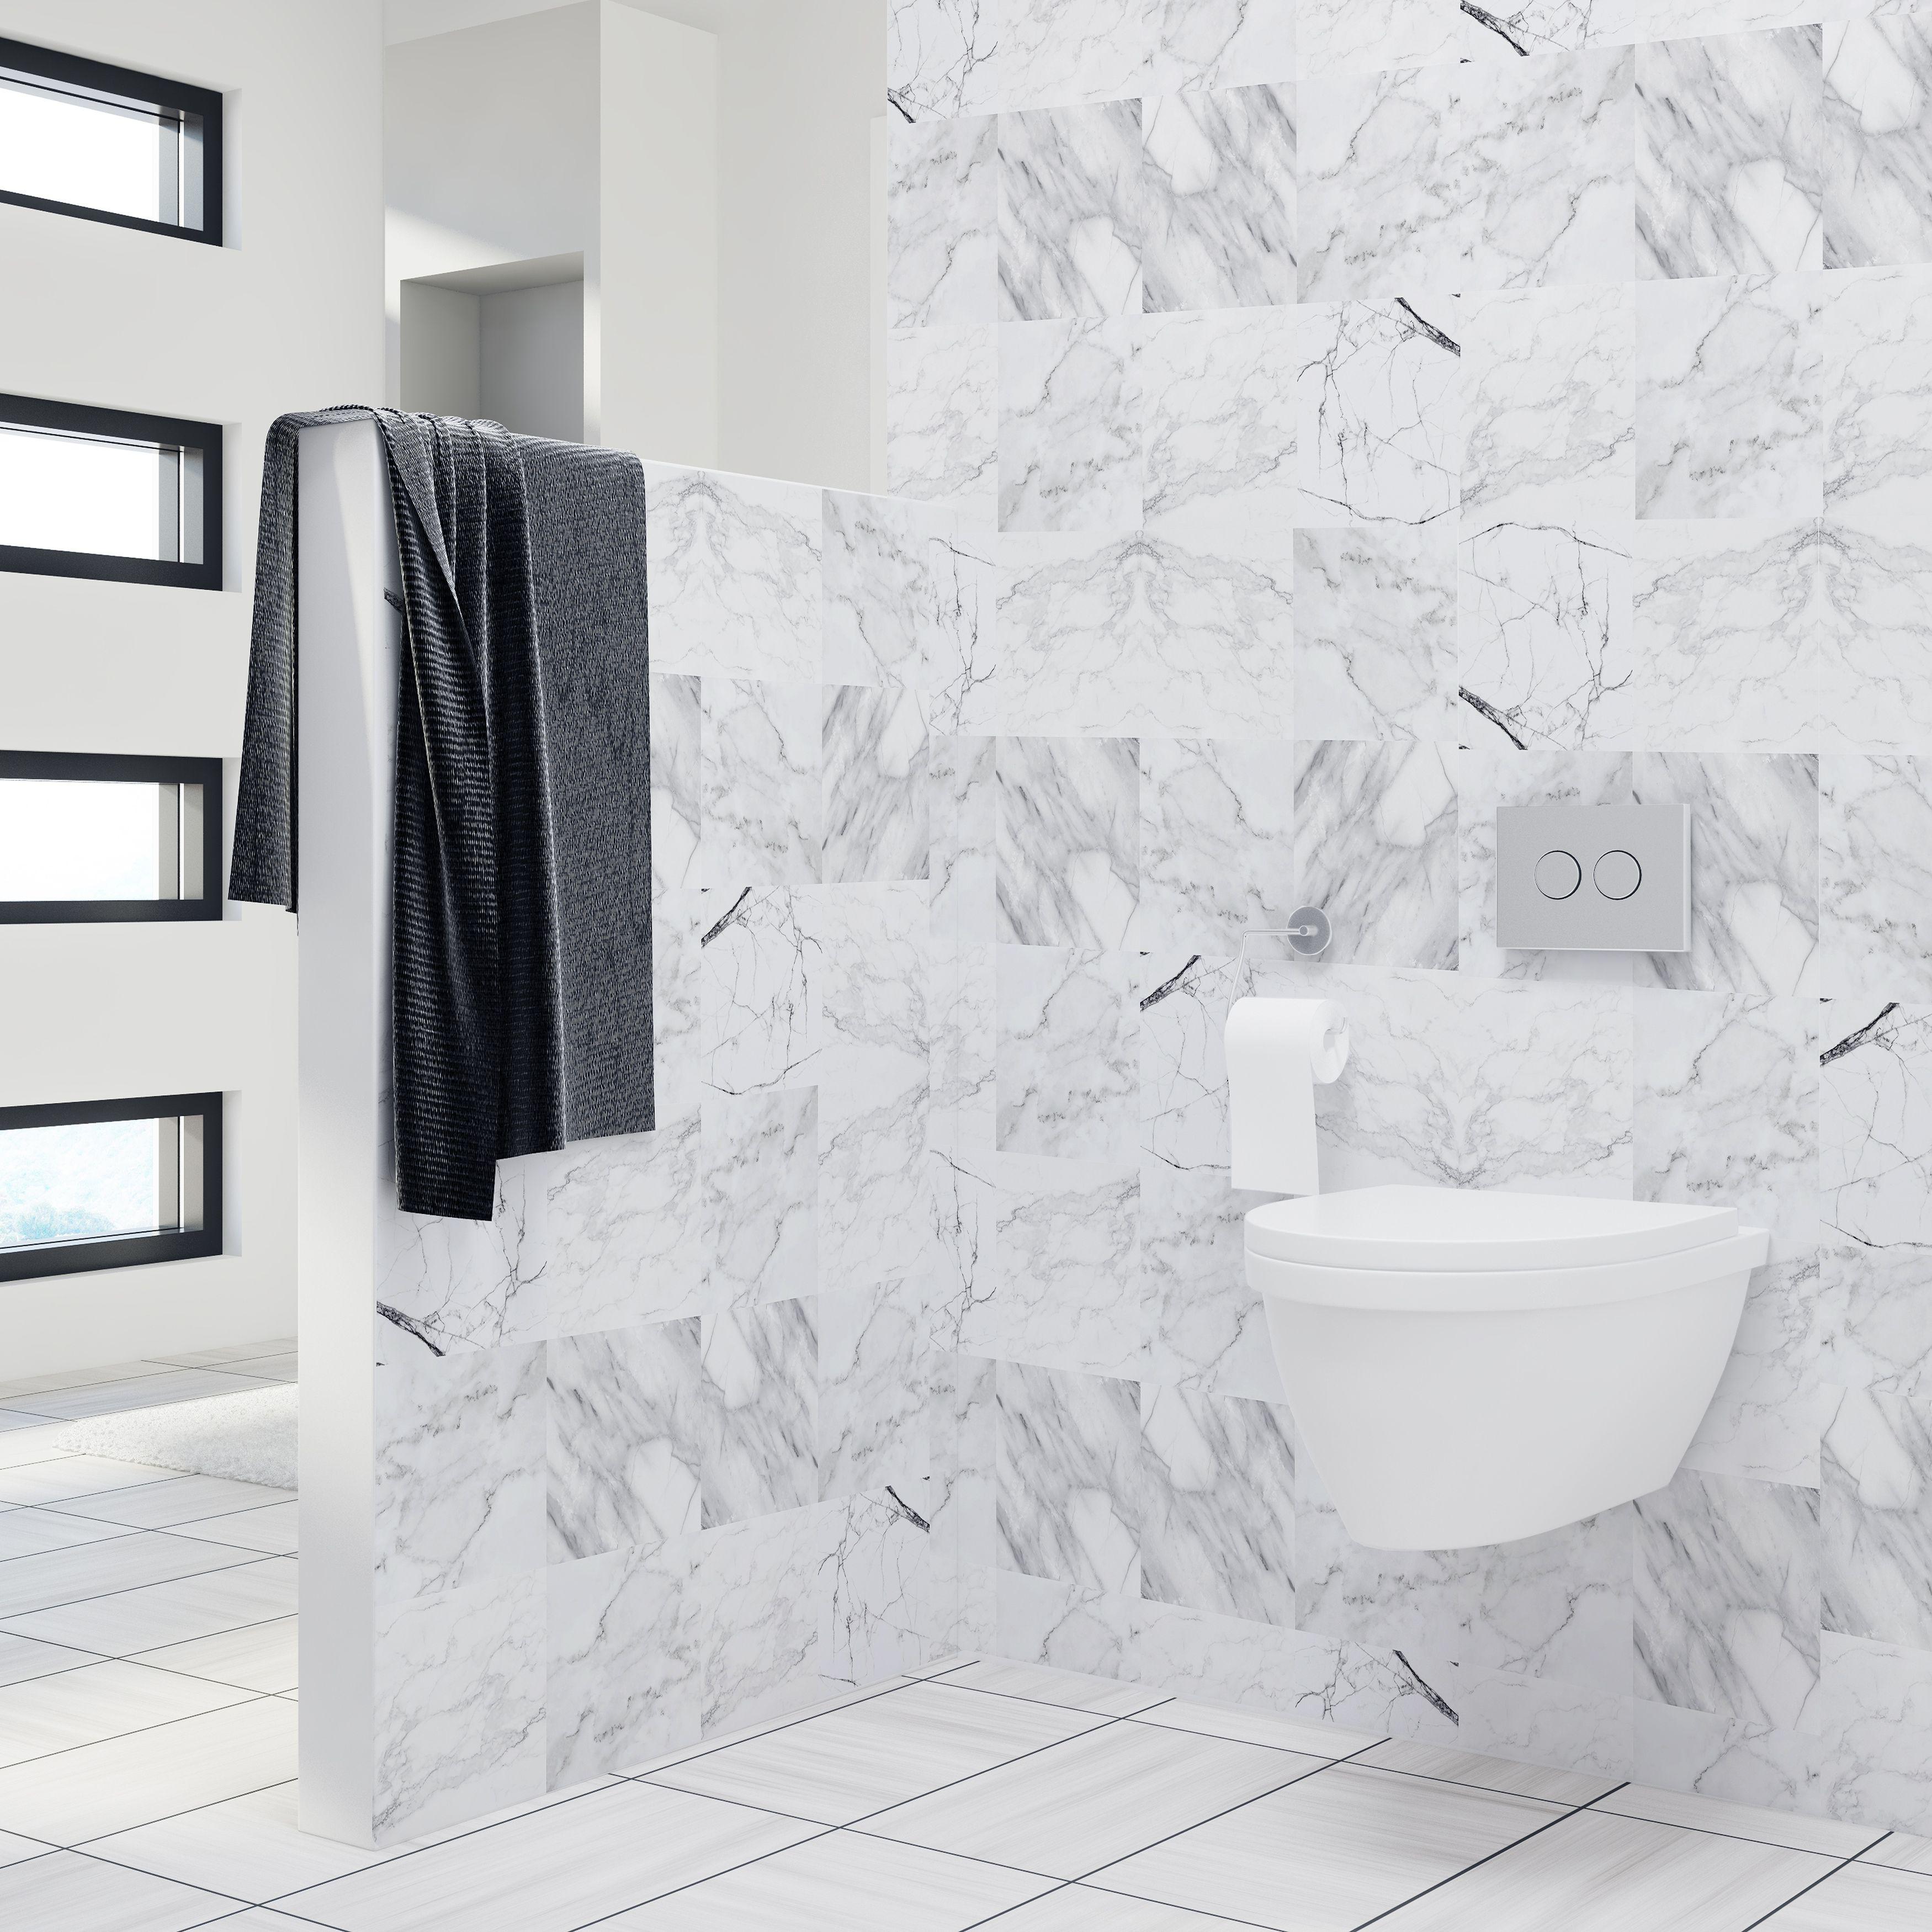 WT1023 Marble Tiles Wall Stickers Mix - 10 cm x 10 cm - 24 pcs.